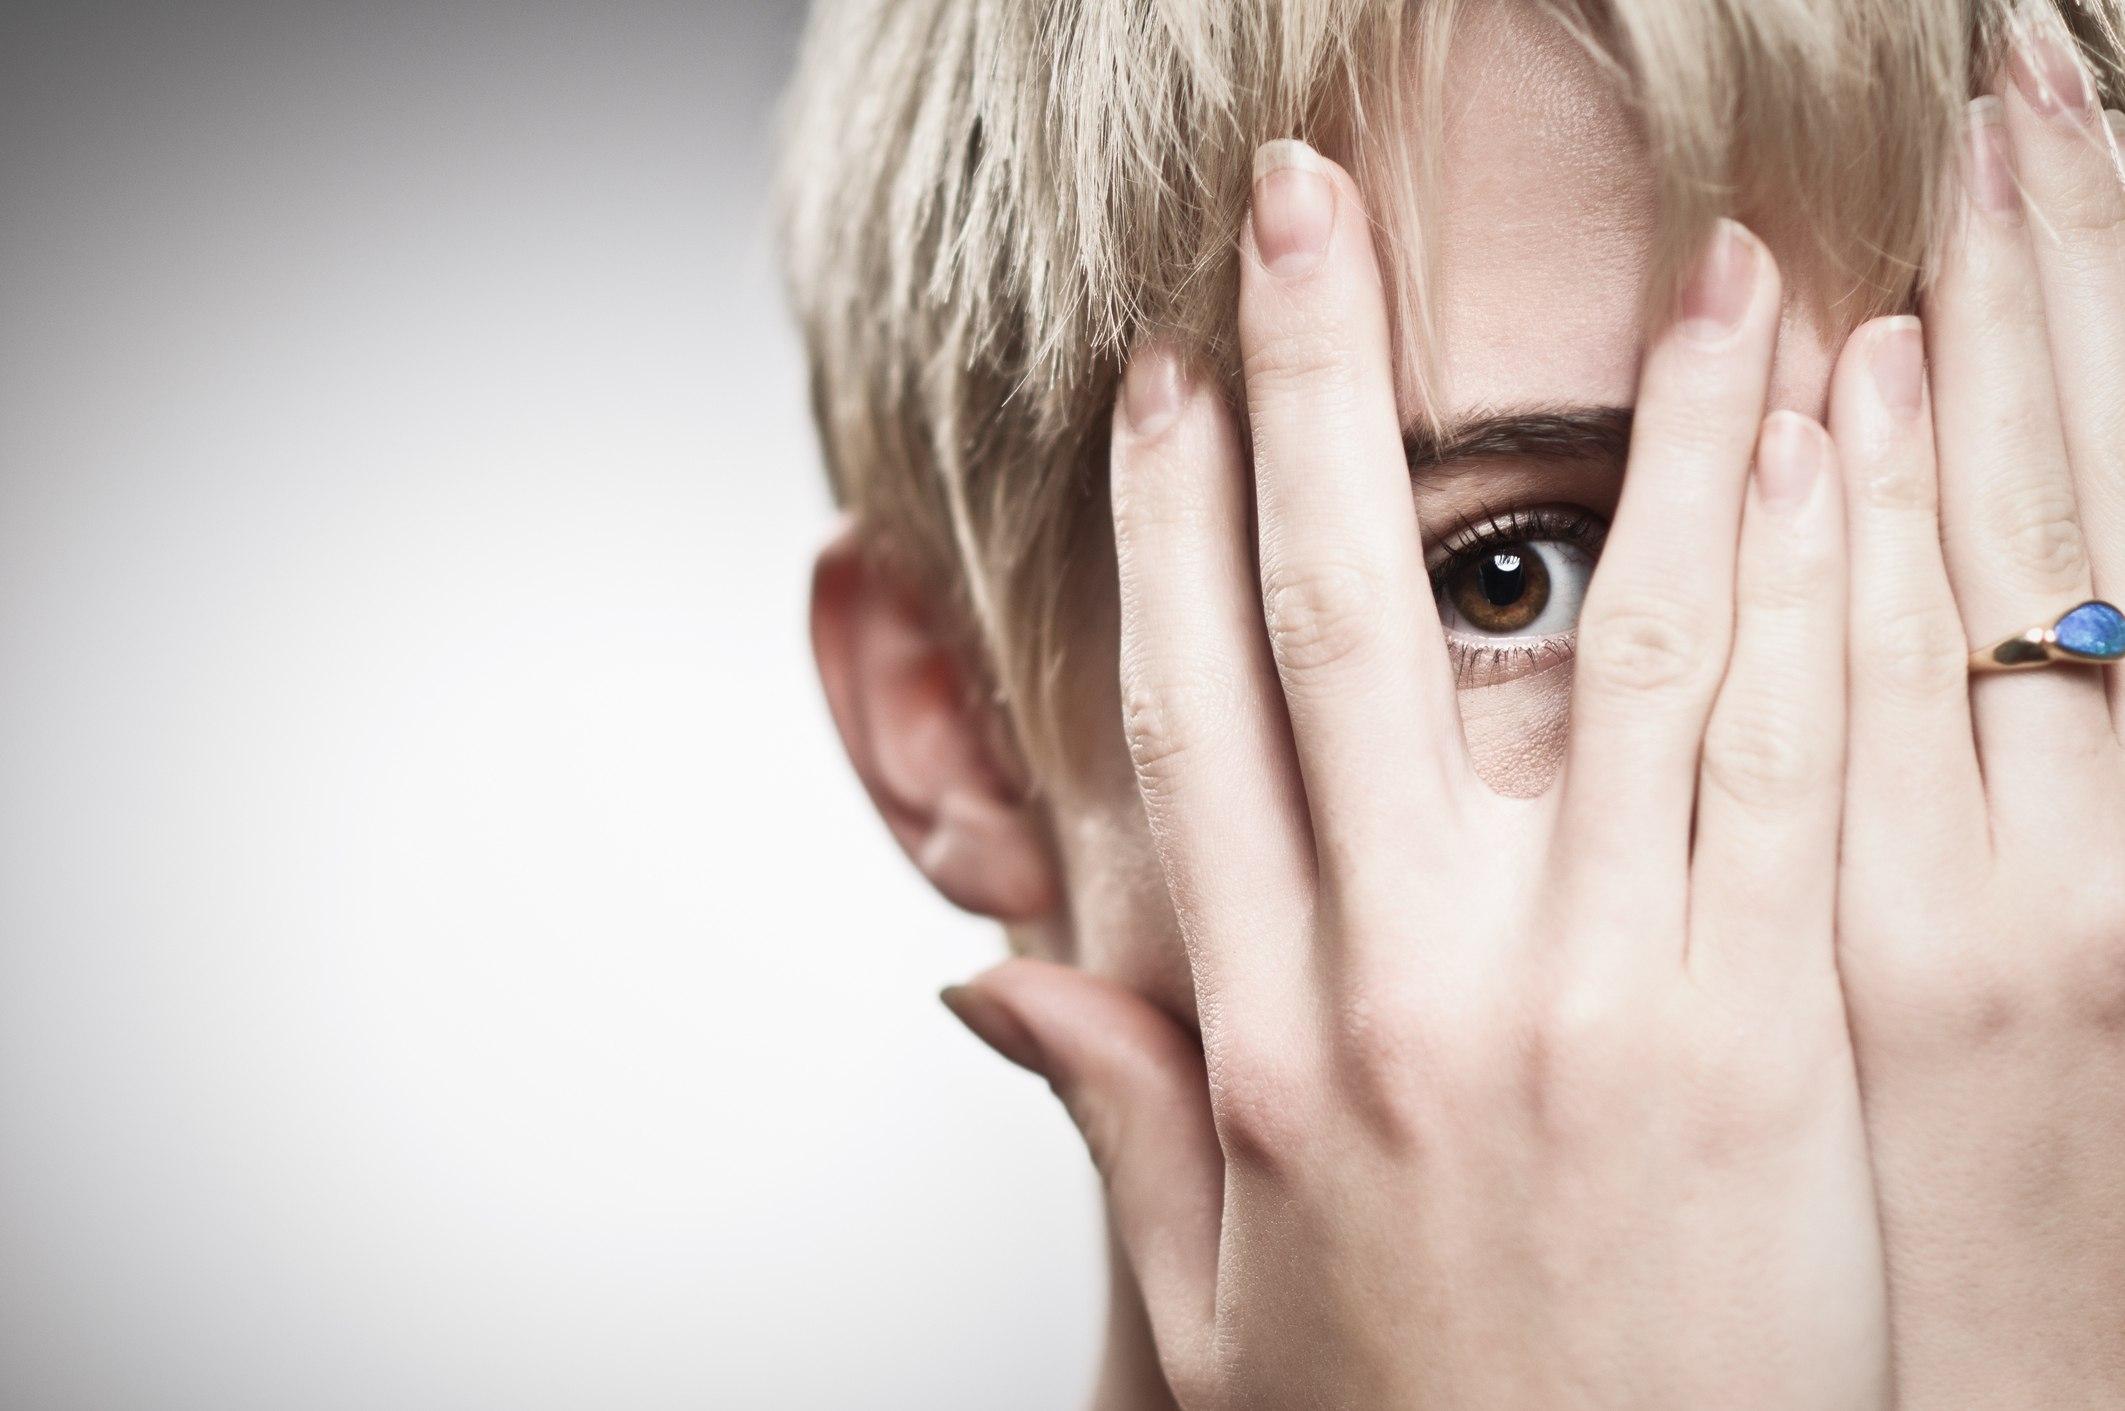 Woman peeking through fingers